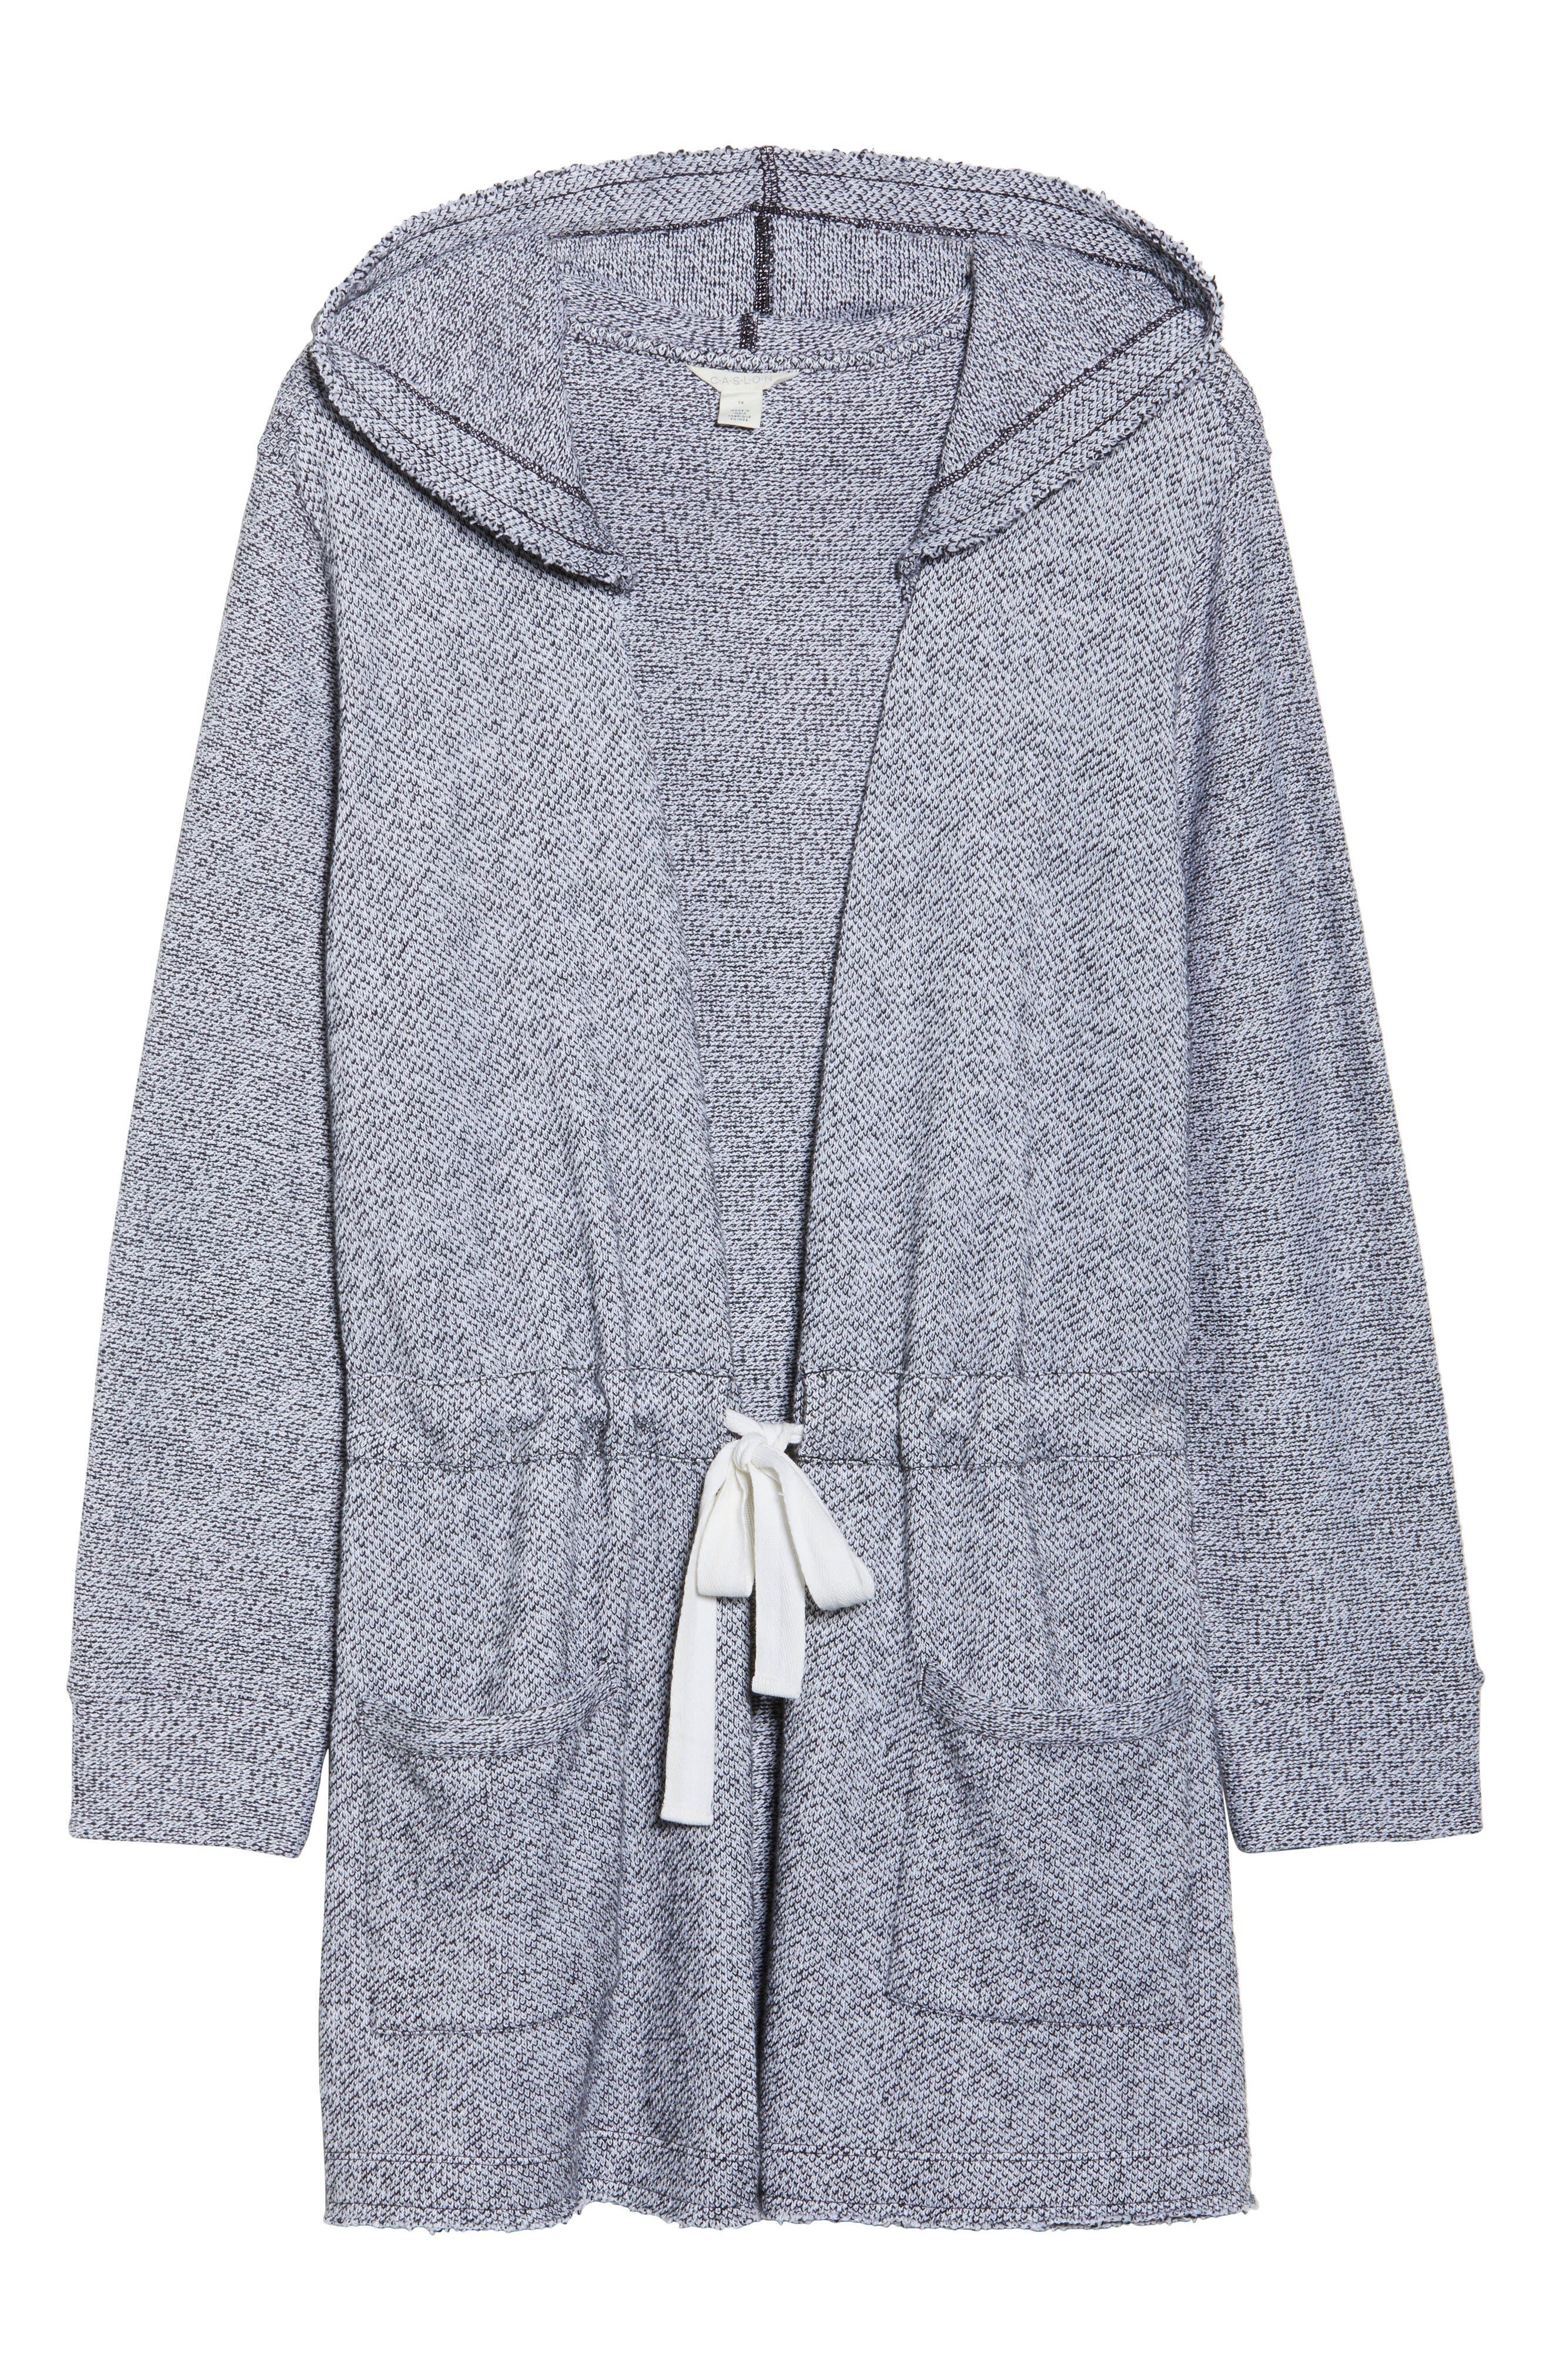 Tie Waist Knit Hooded Jacket,                             Alternate thumbnail 6, color,                             002